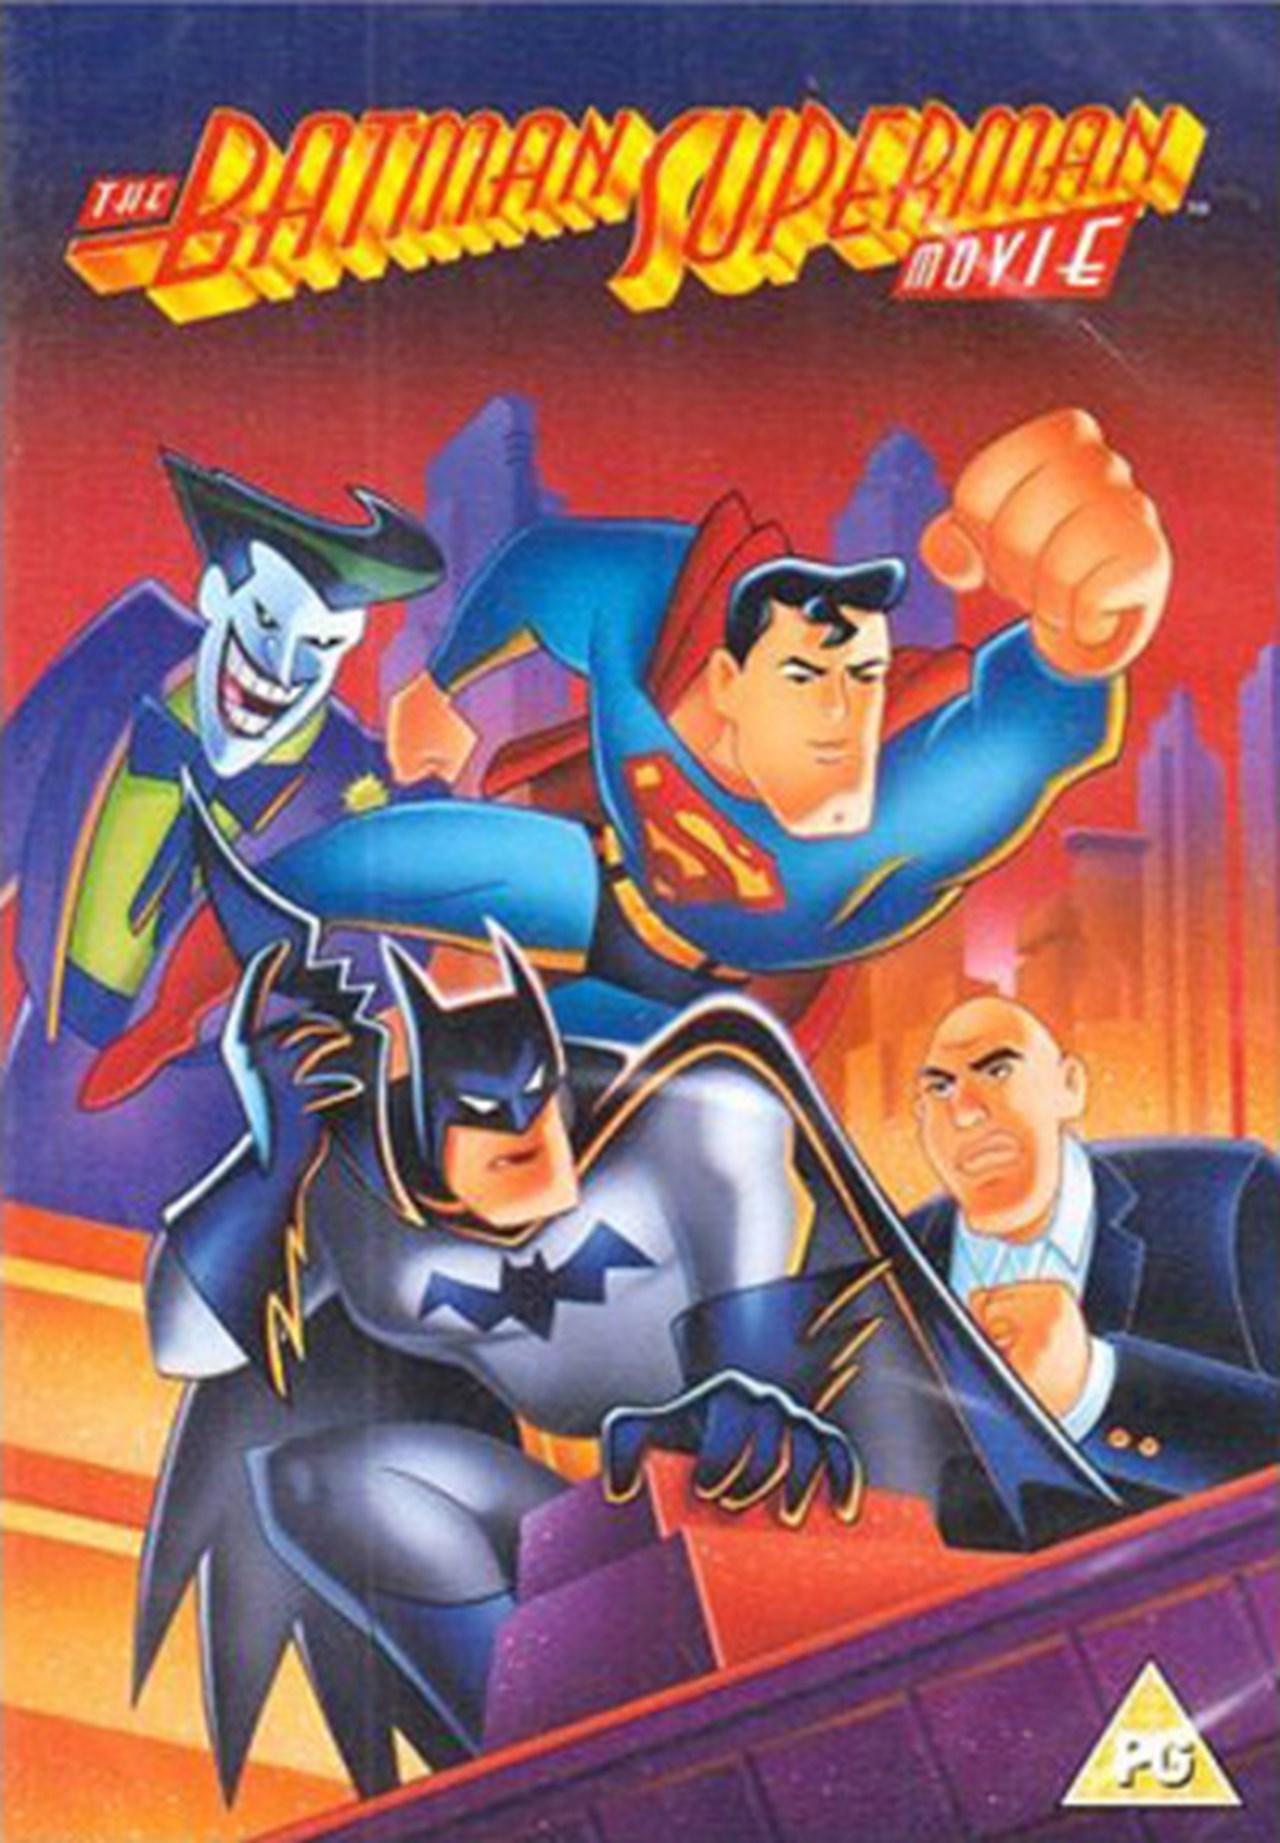 The Batman Superman Movie - 1